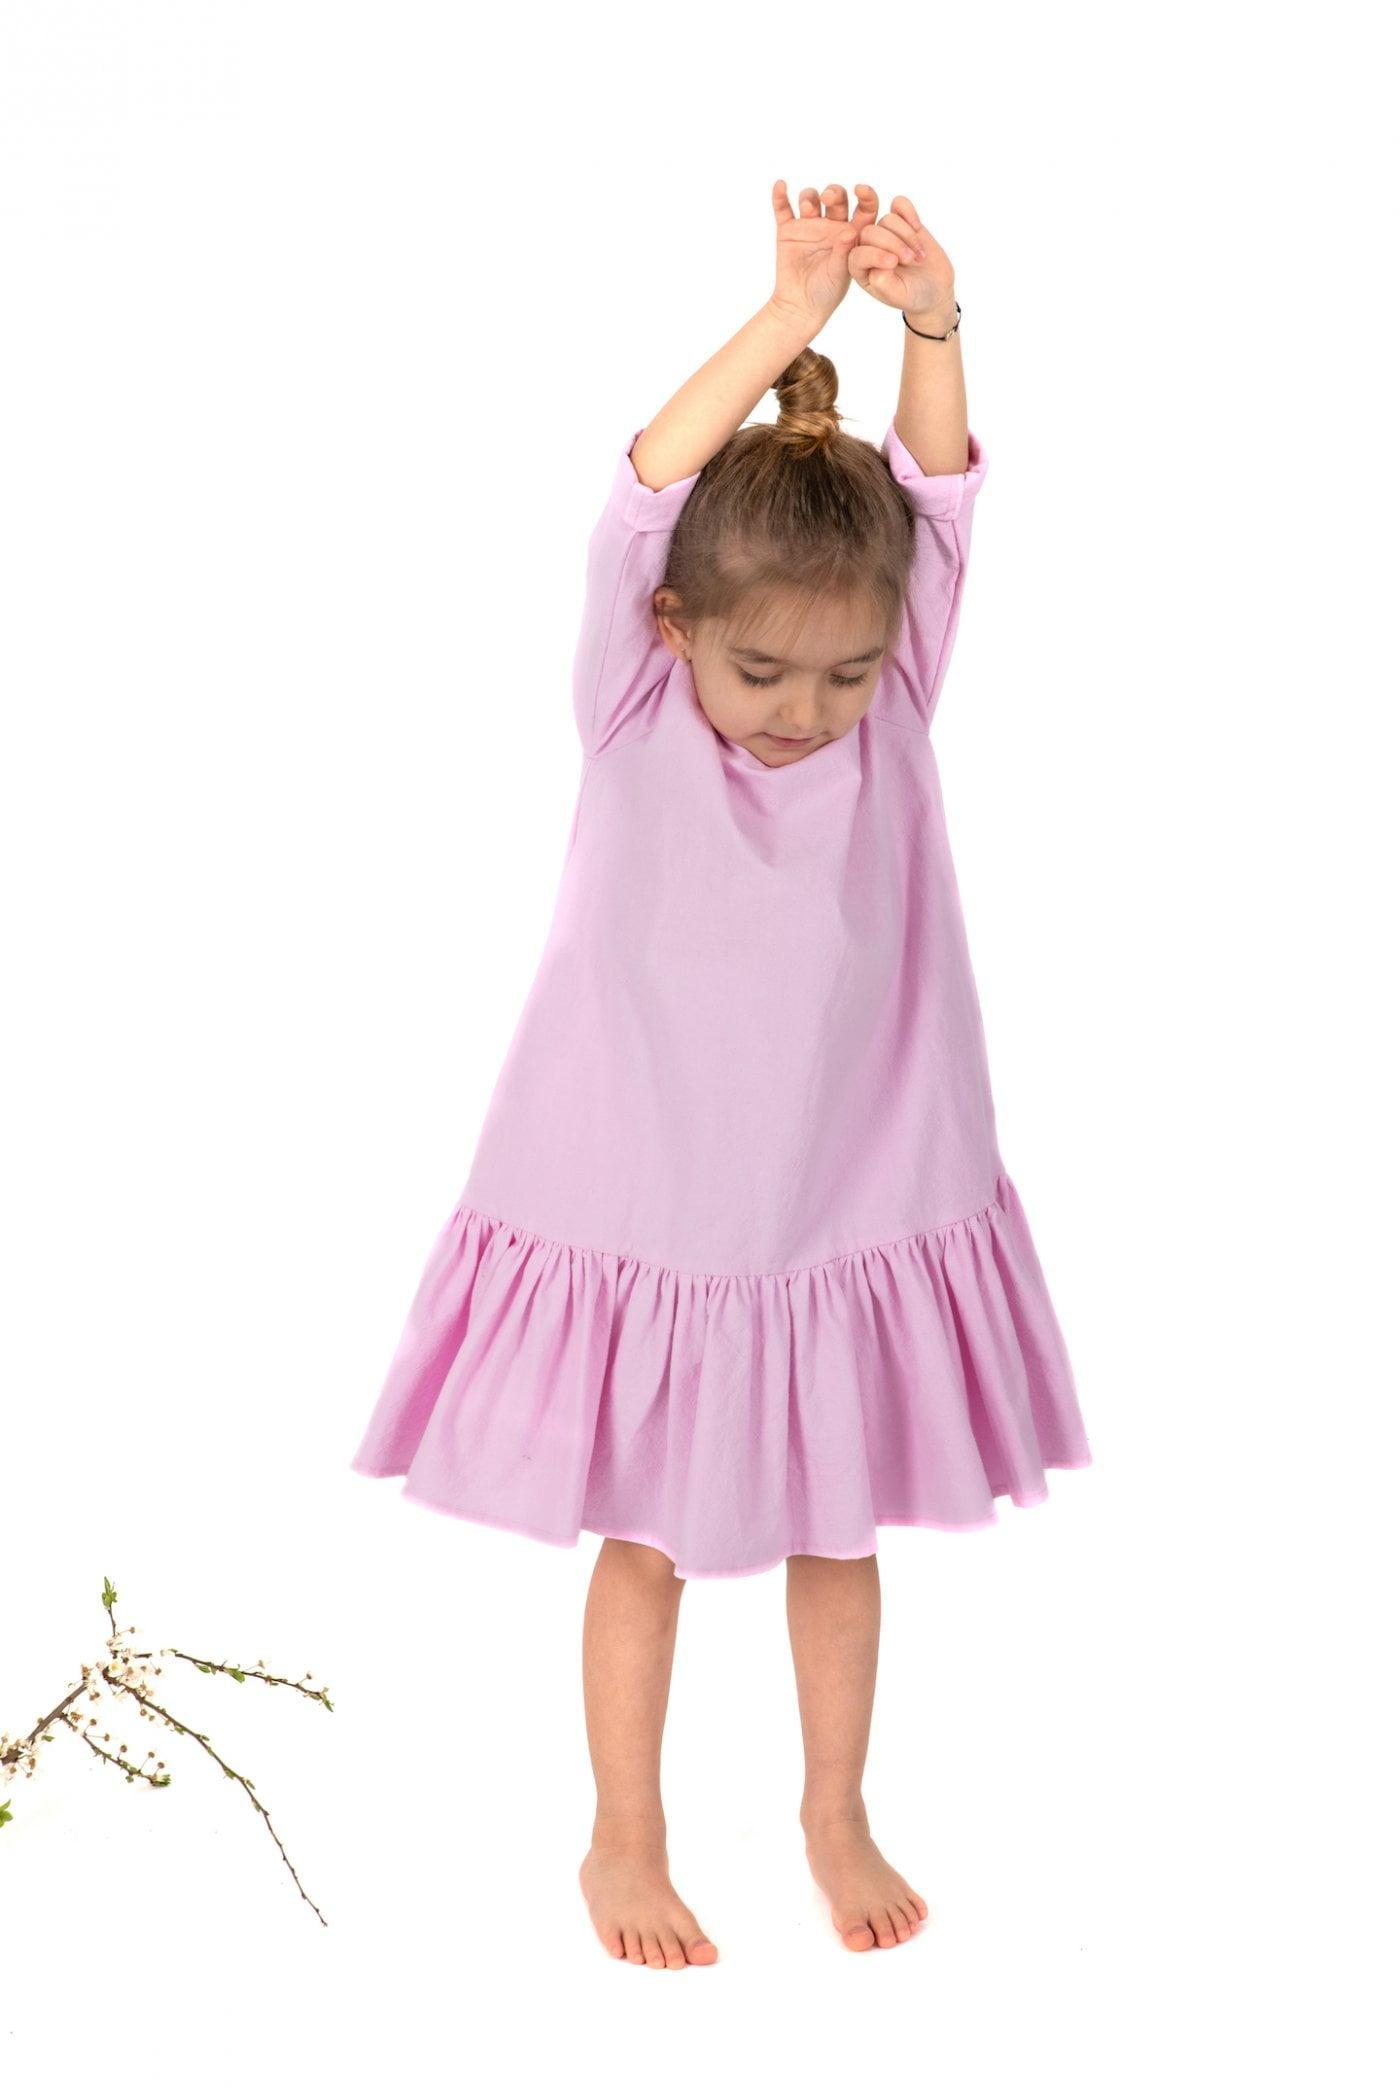 rochita lali roz gri inchis verde pal roz pal caramiziu corai bumbac